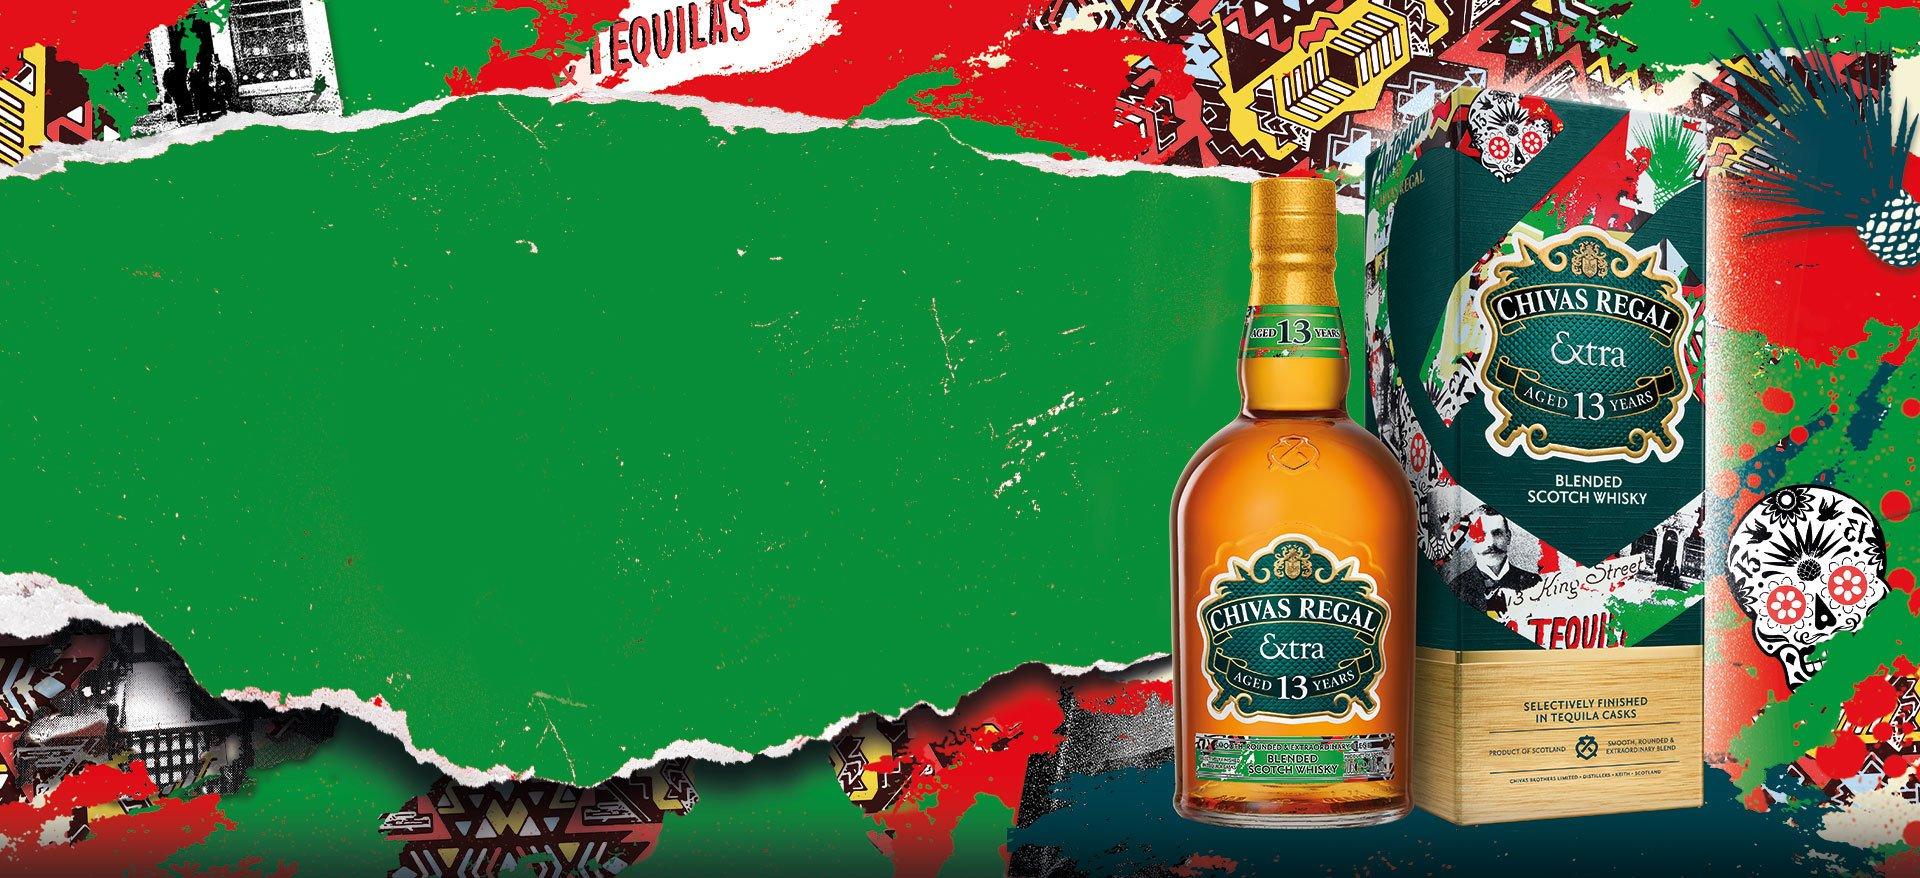 Chivas Extra 13 Tequila Cask